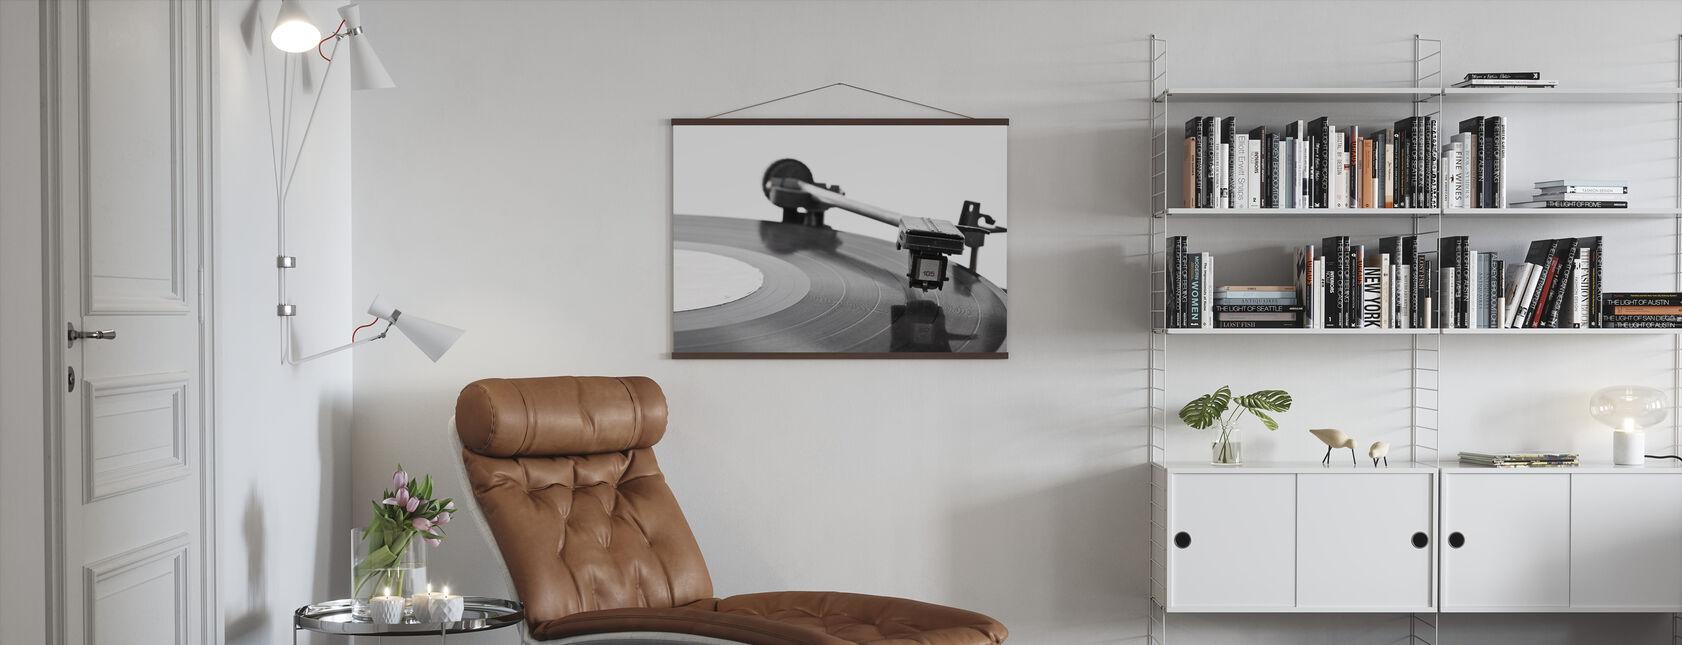 Old Vinyl Player - Poster - Living Room